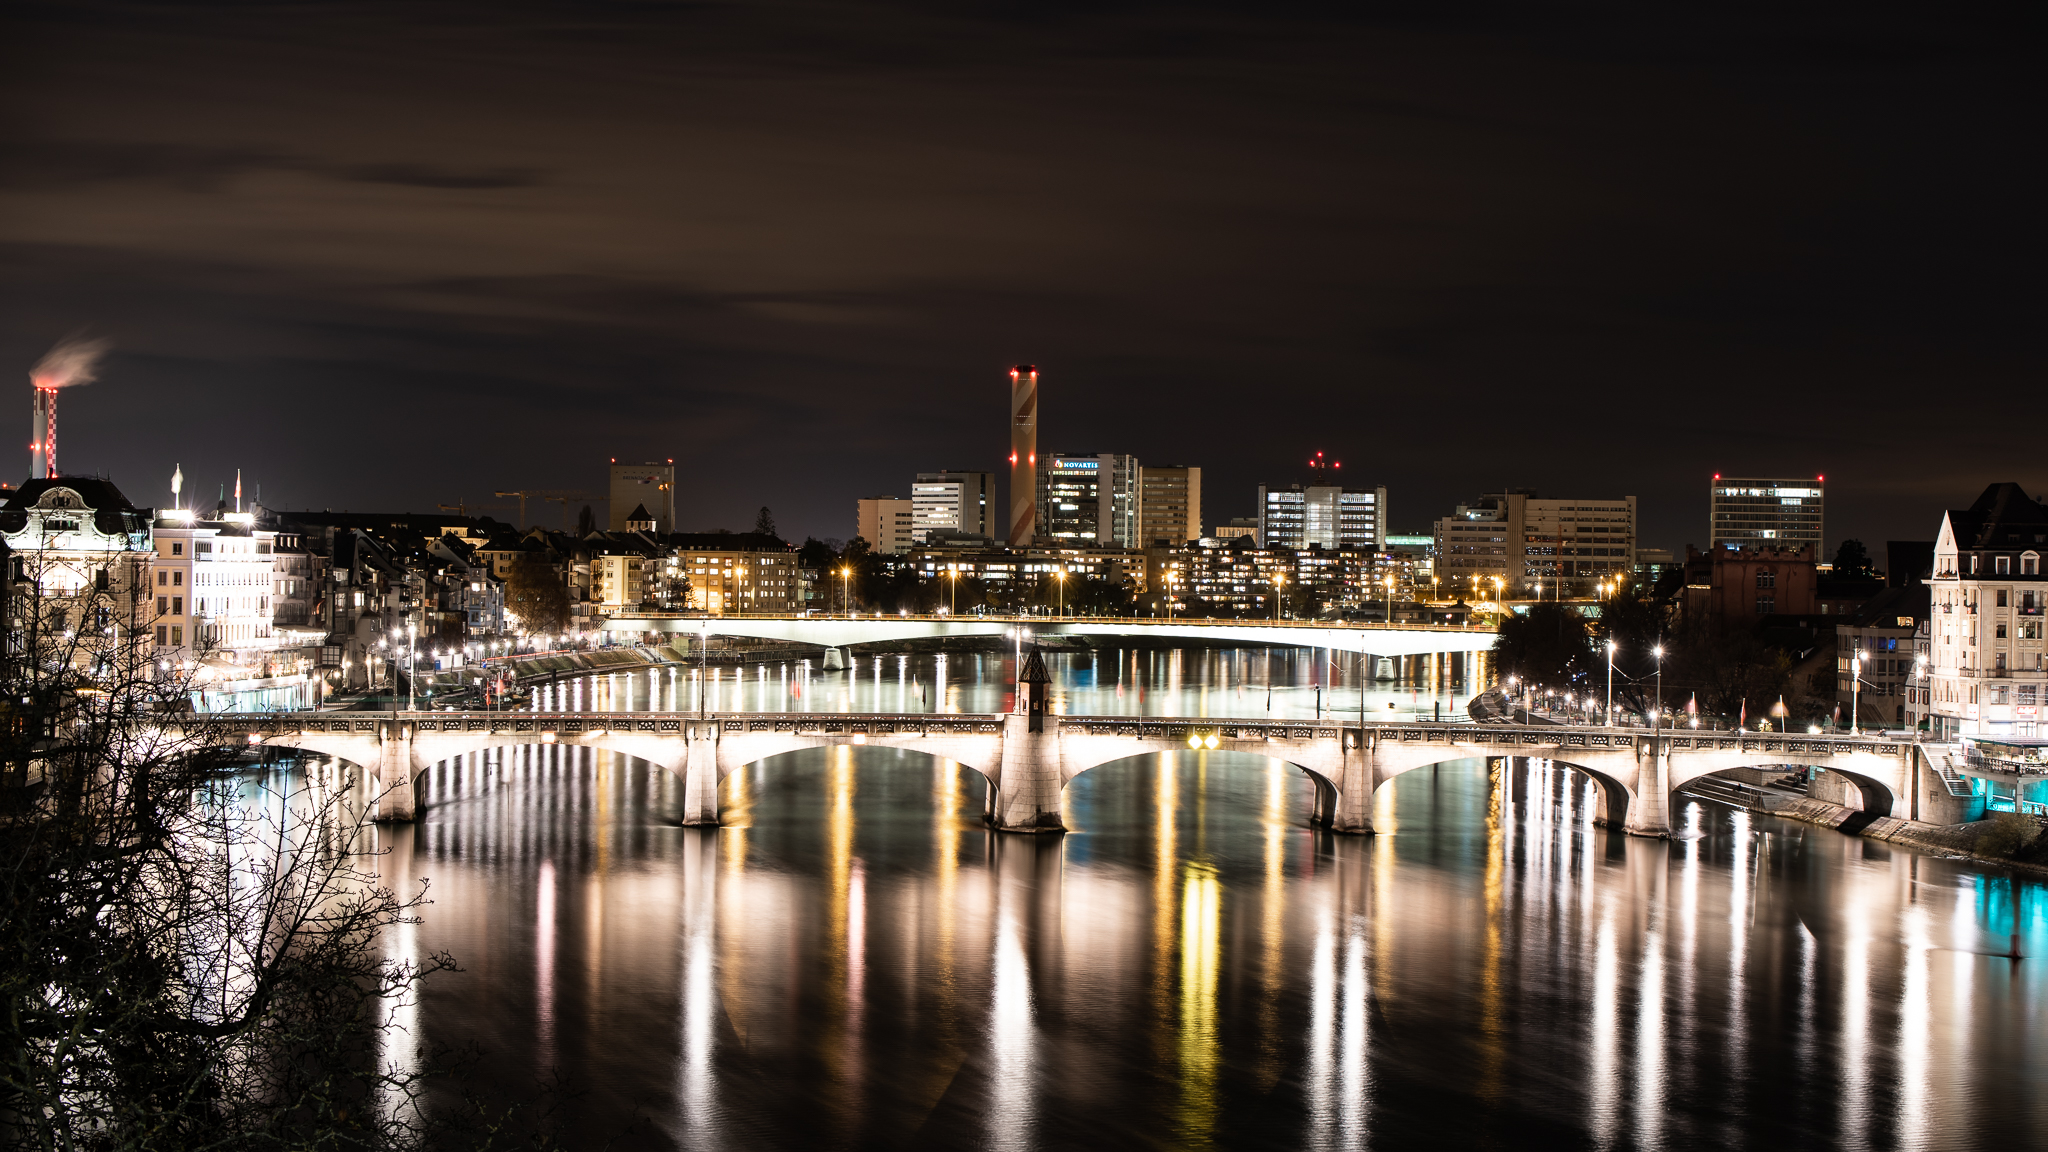 Pfalz Basel, Switzerland